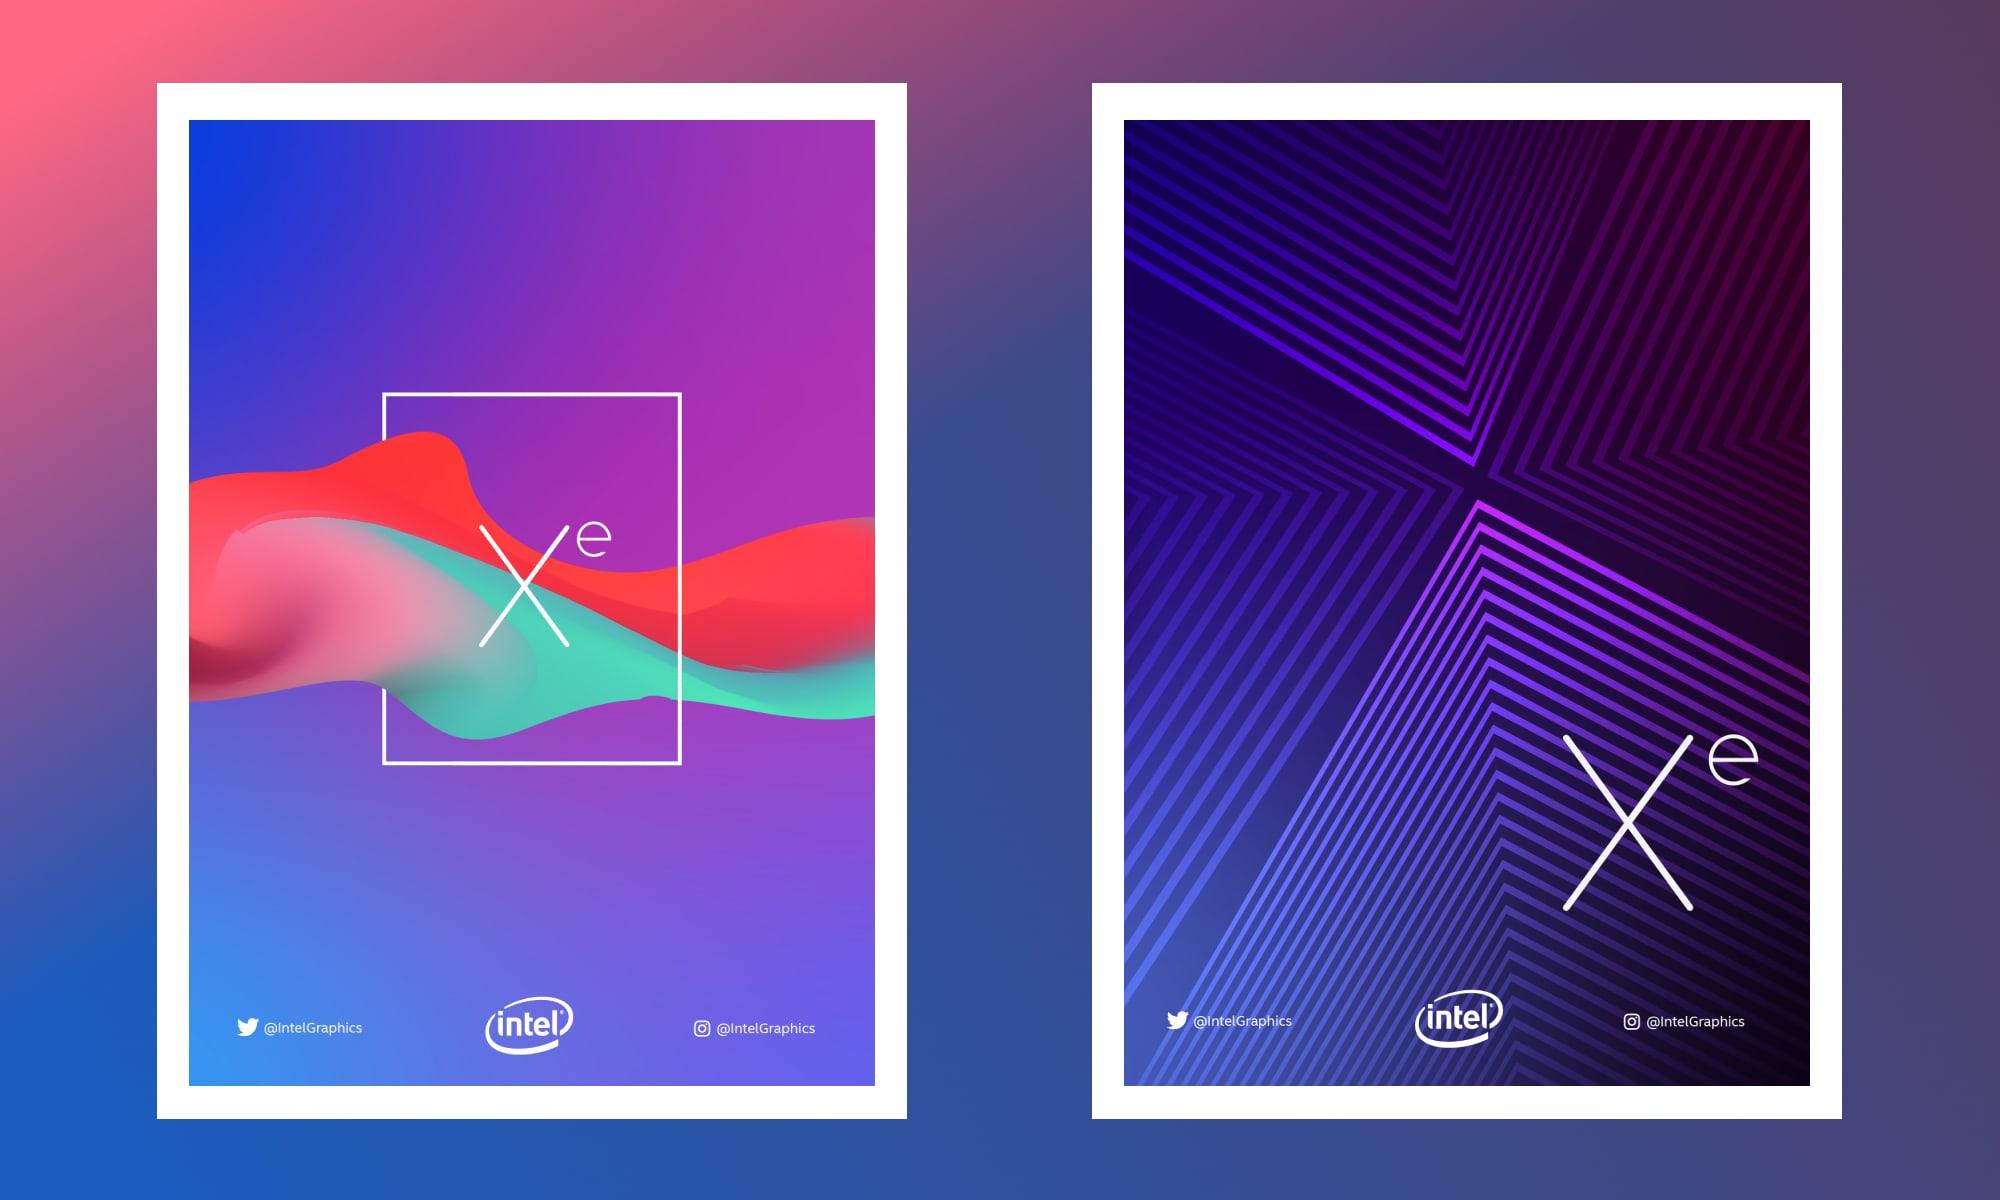 Pablo Ladosa_ Intel_Design 2